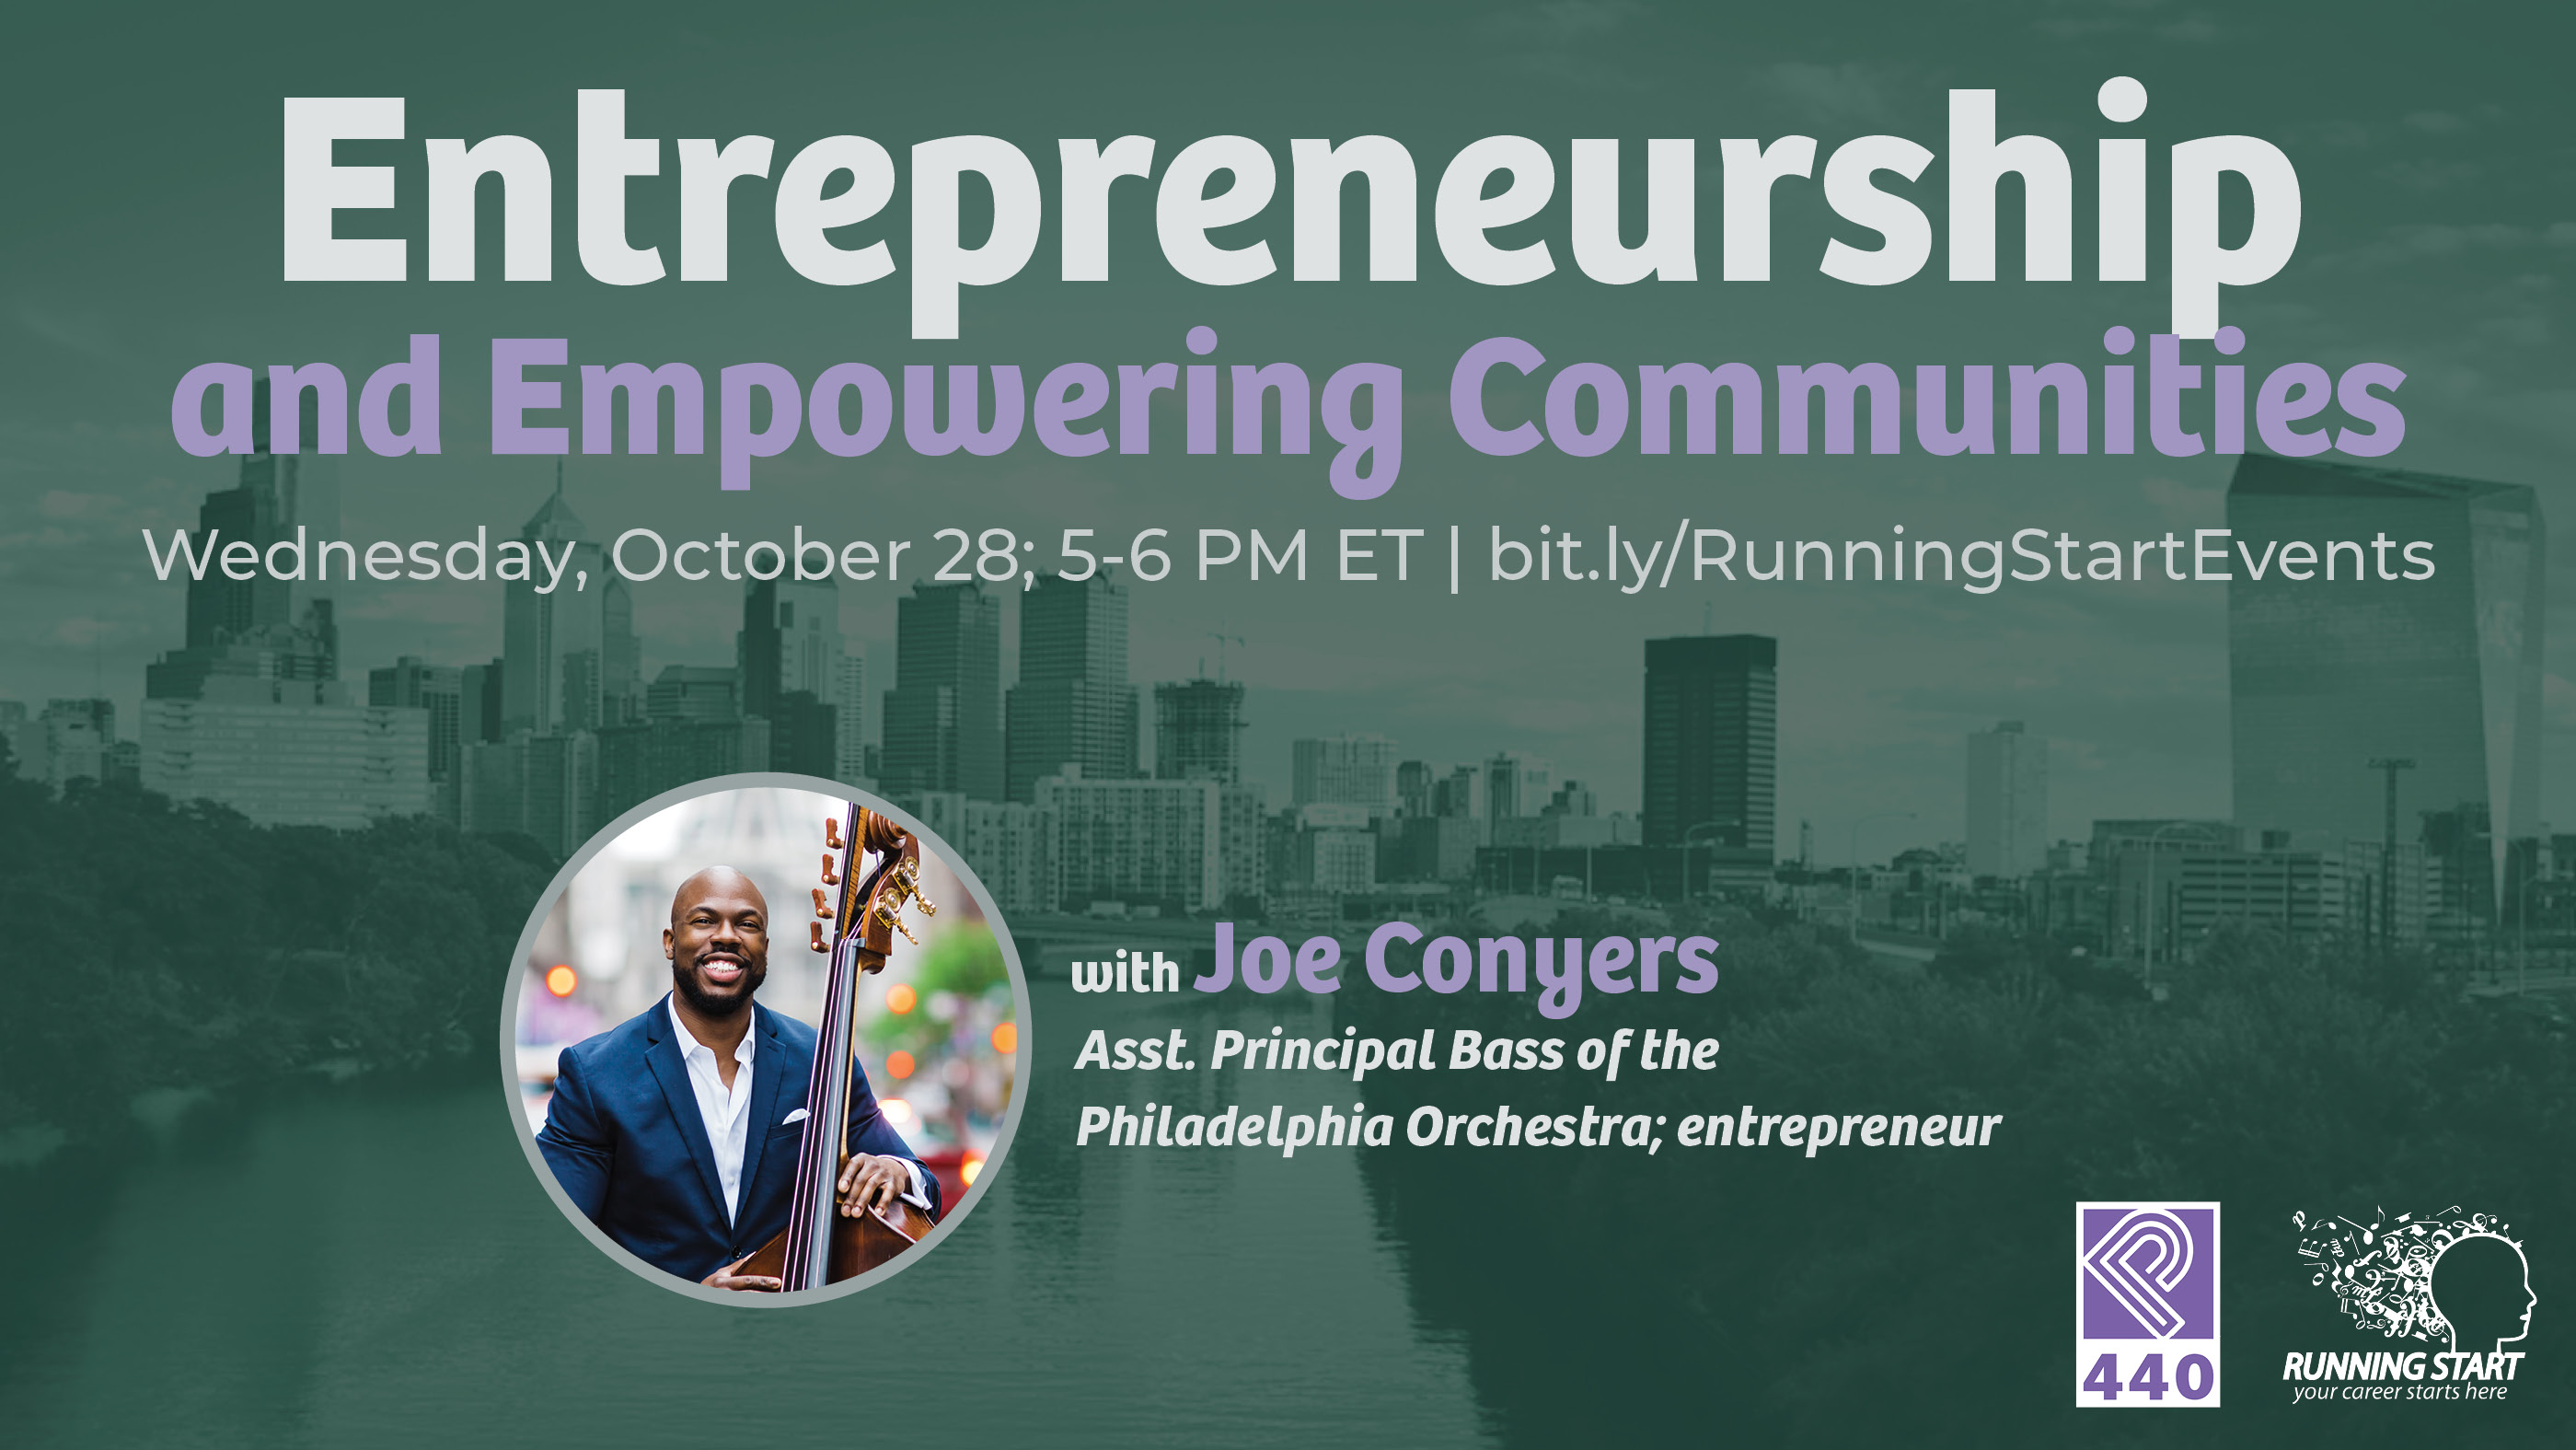 Entrepreneurship and Empowering Communities image